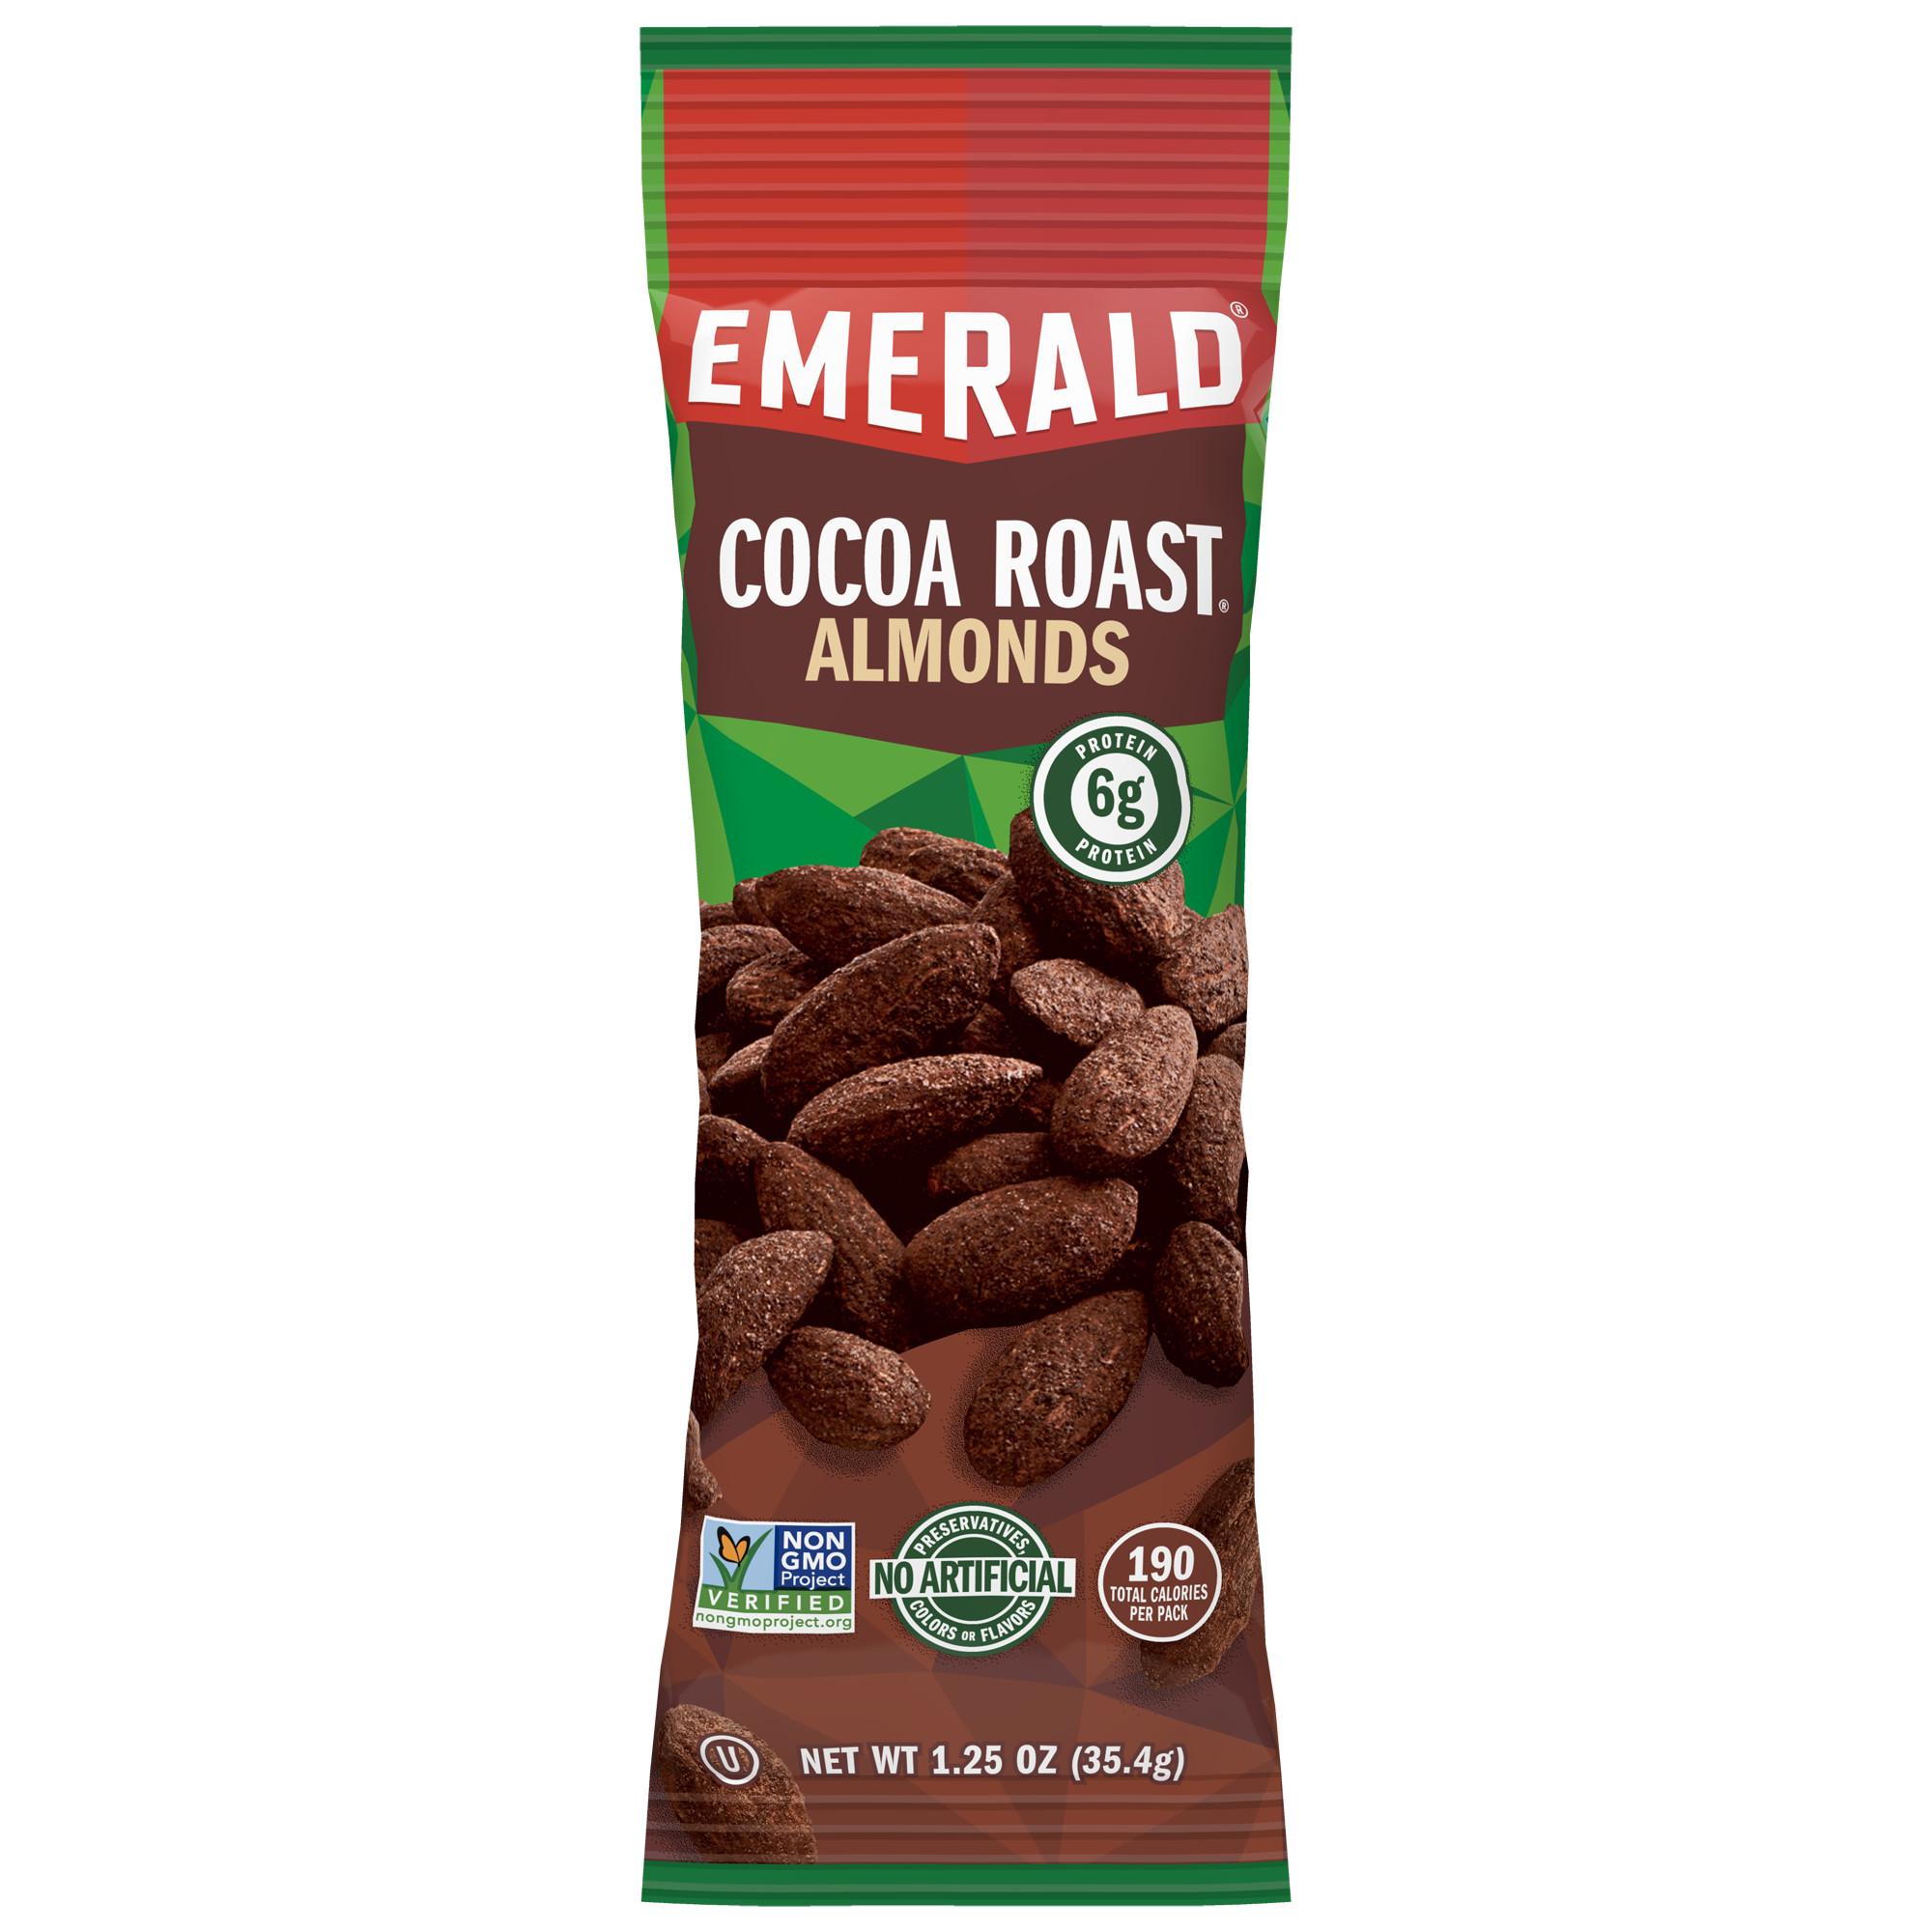 Emerald Nuts, Cocoa Roast Almonds, Single-Serve 1.25 Oz, 12 Ct